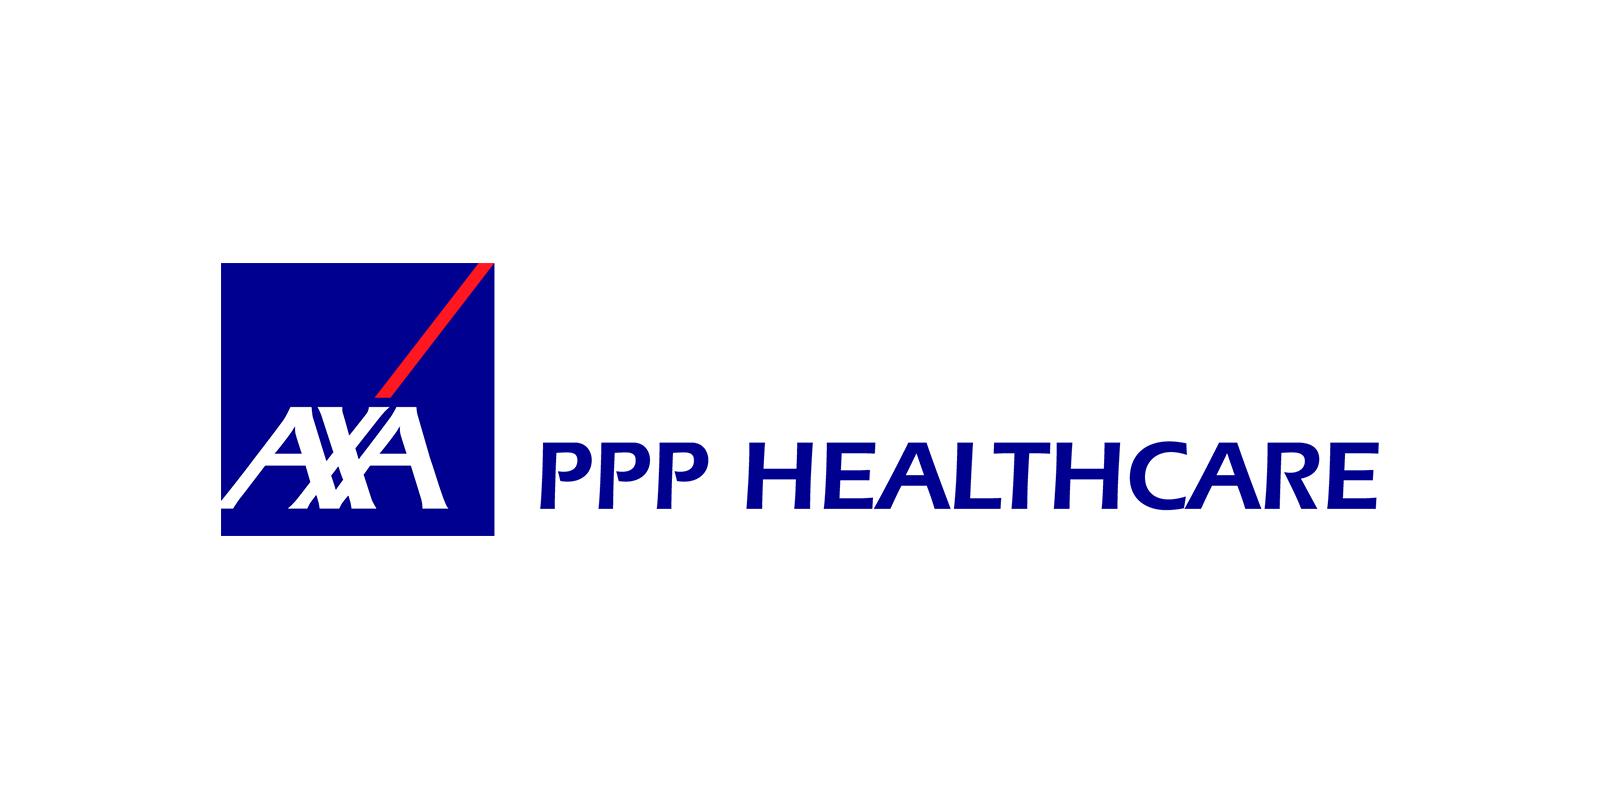 AXA PPP Healthcare - AXA Private Health Insurance